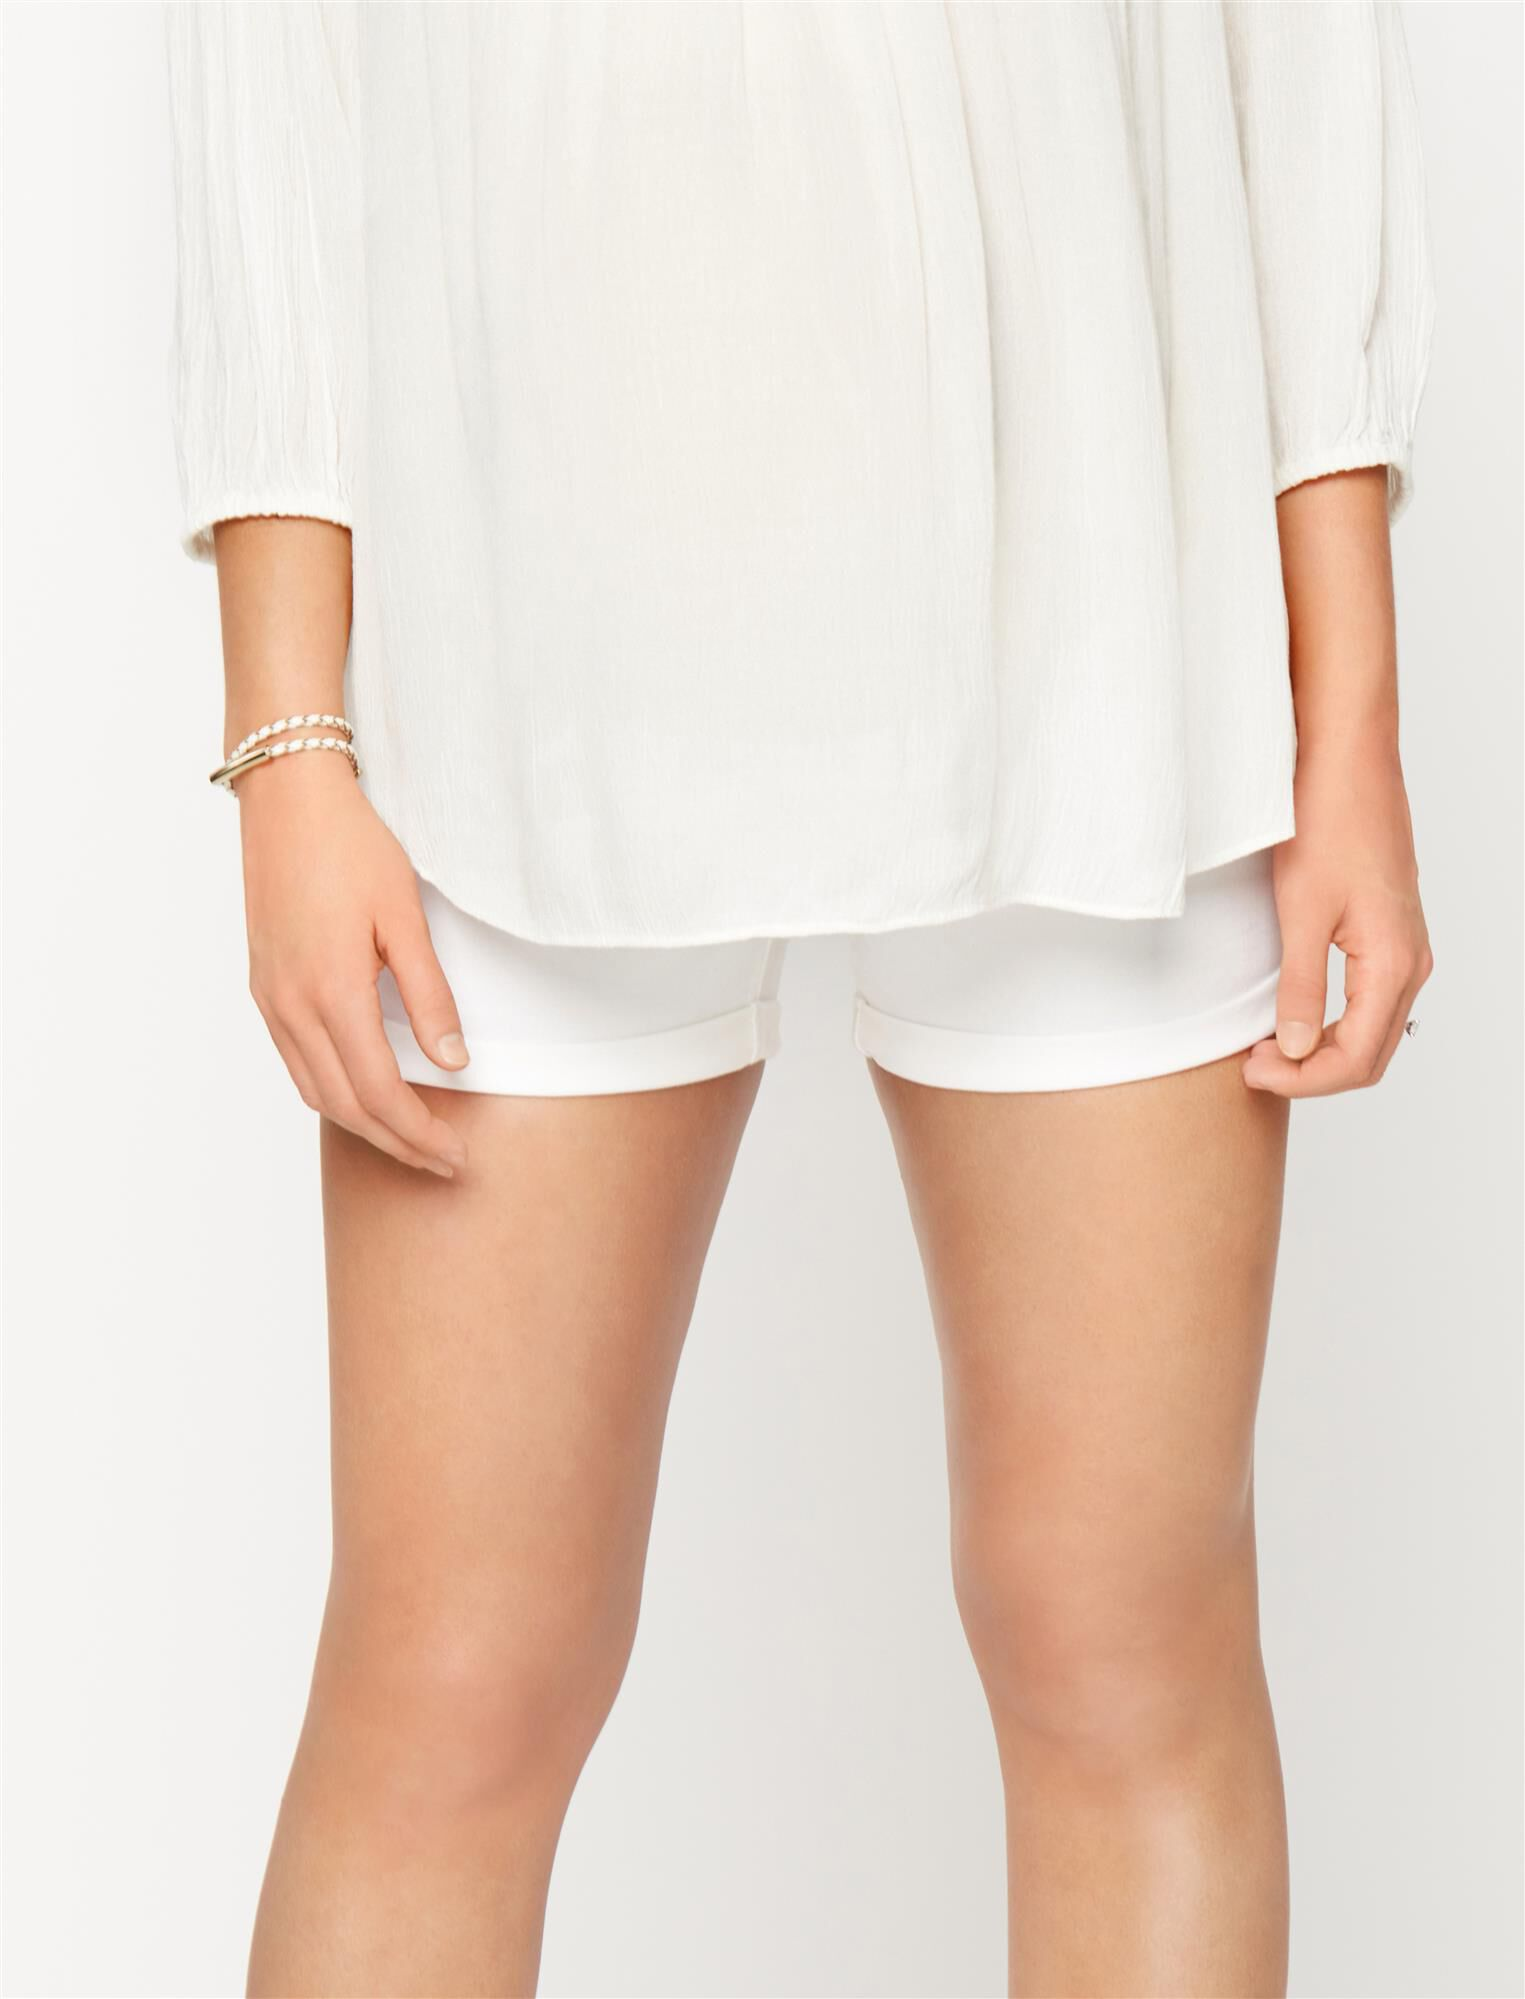 Luxe Essentials Denim Secret Fit Belly Cuffed Maternity Shorts- White